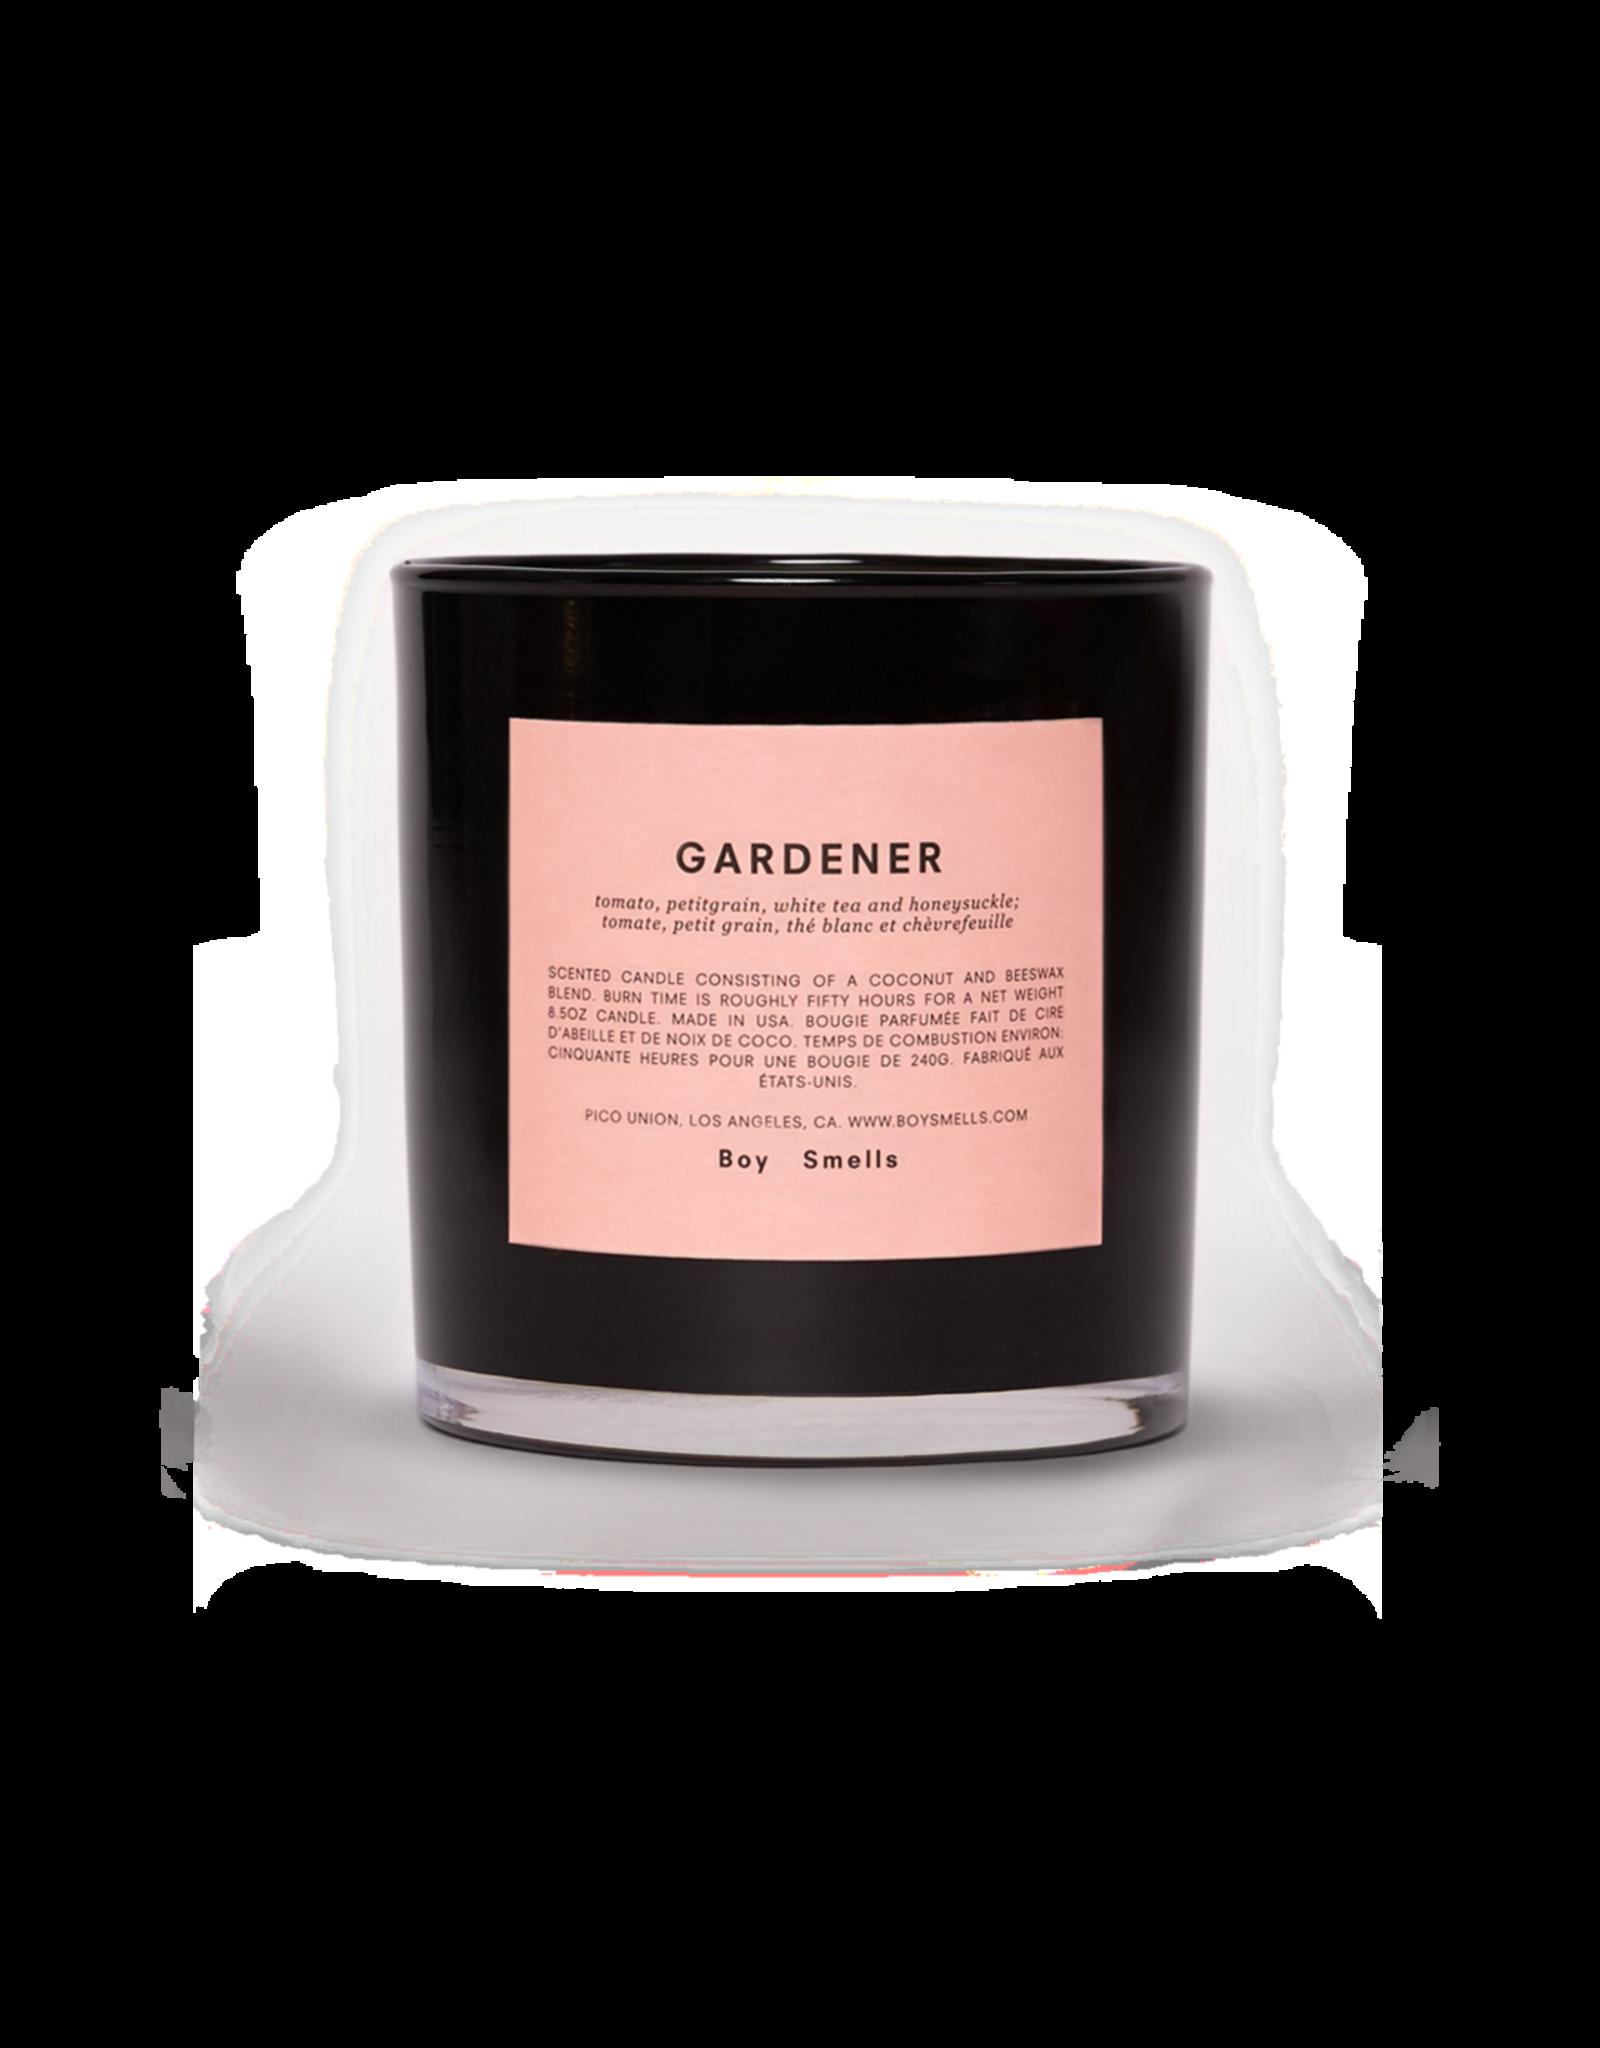 Gardener Candle